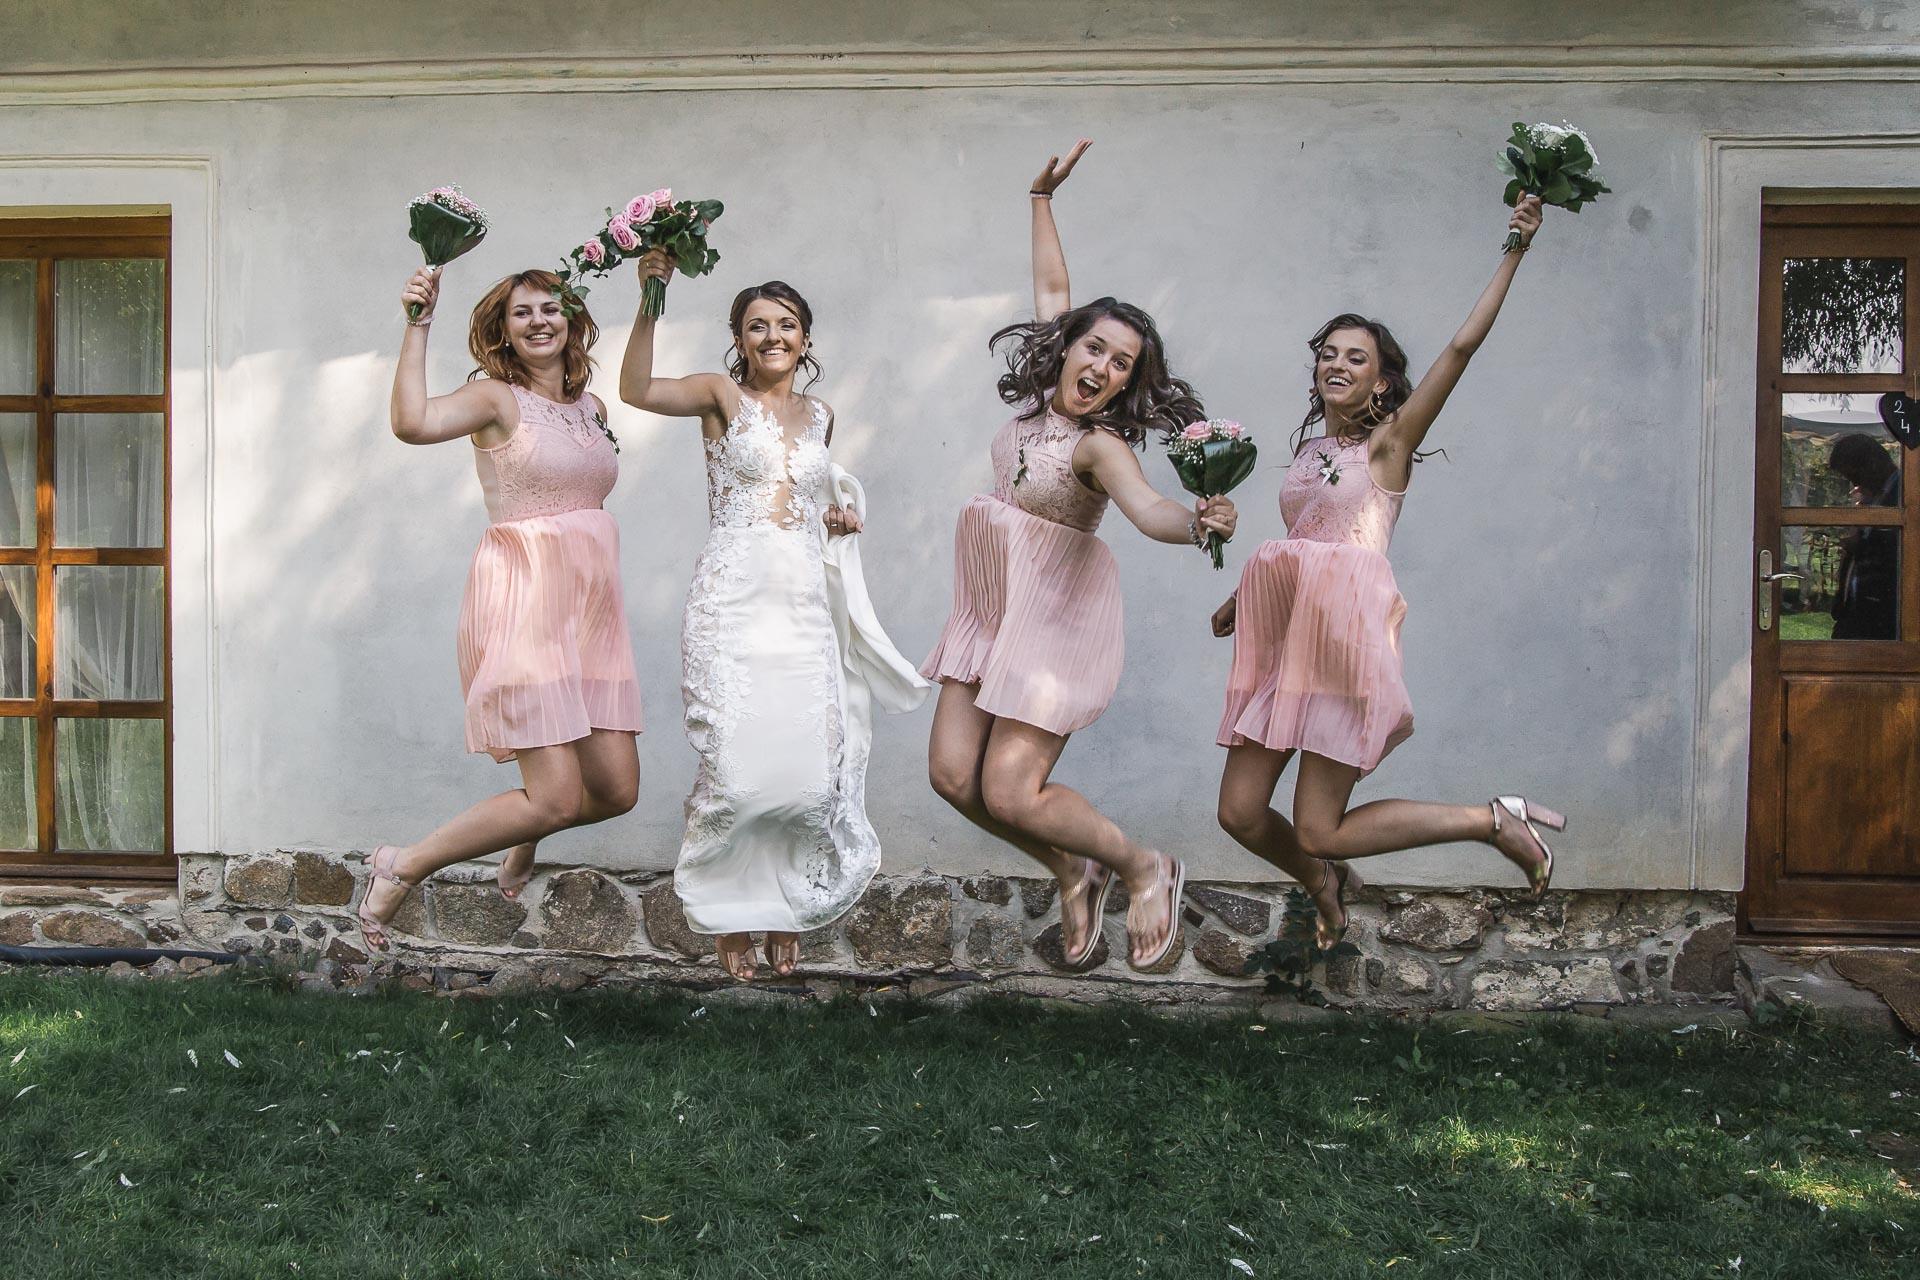 svatební-fotograf-wedding-svatebni-video-orlík-vltava-kostel-statek-stodola-boho-svatba-Beautyfoto-422